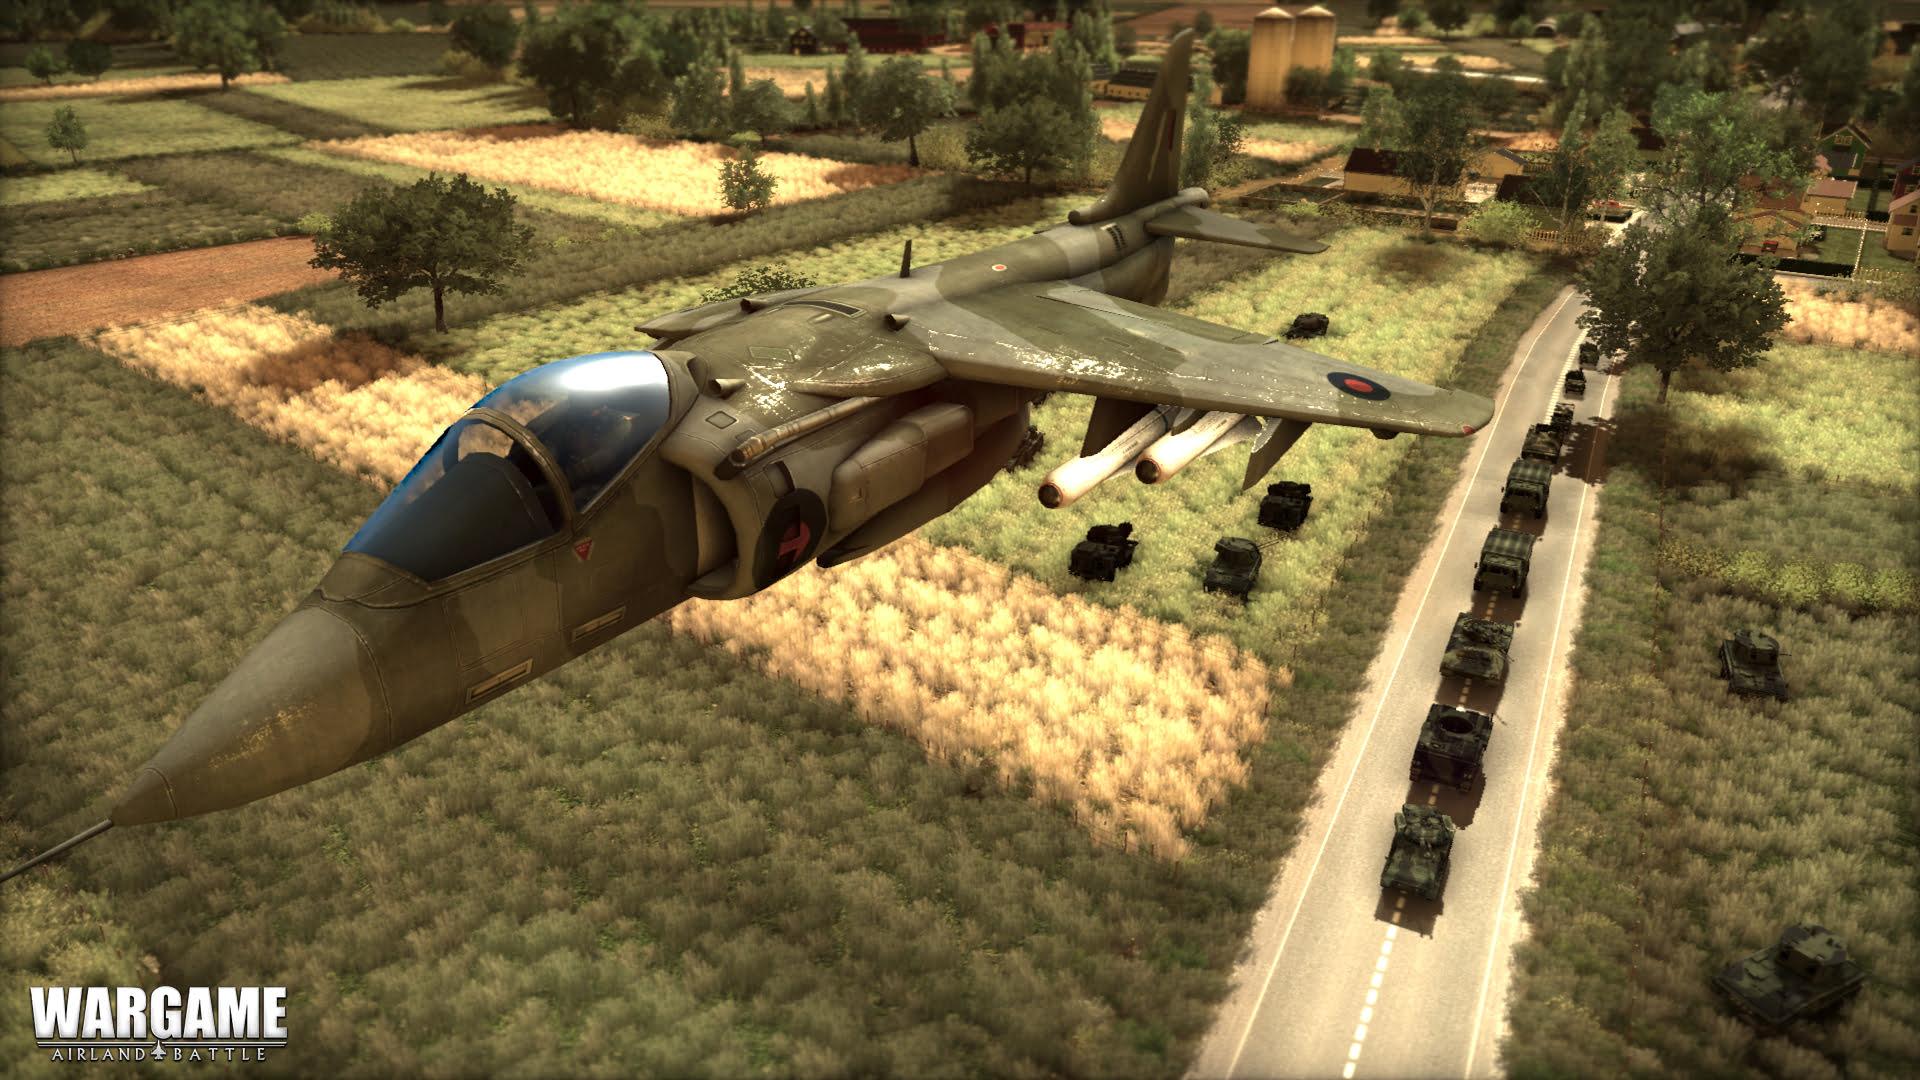 wargame airland battle exposes british units via